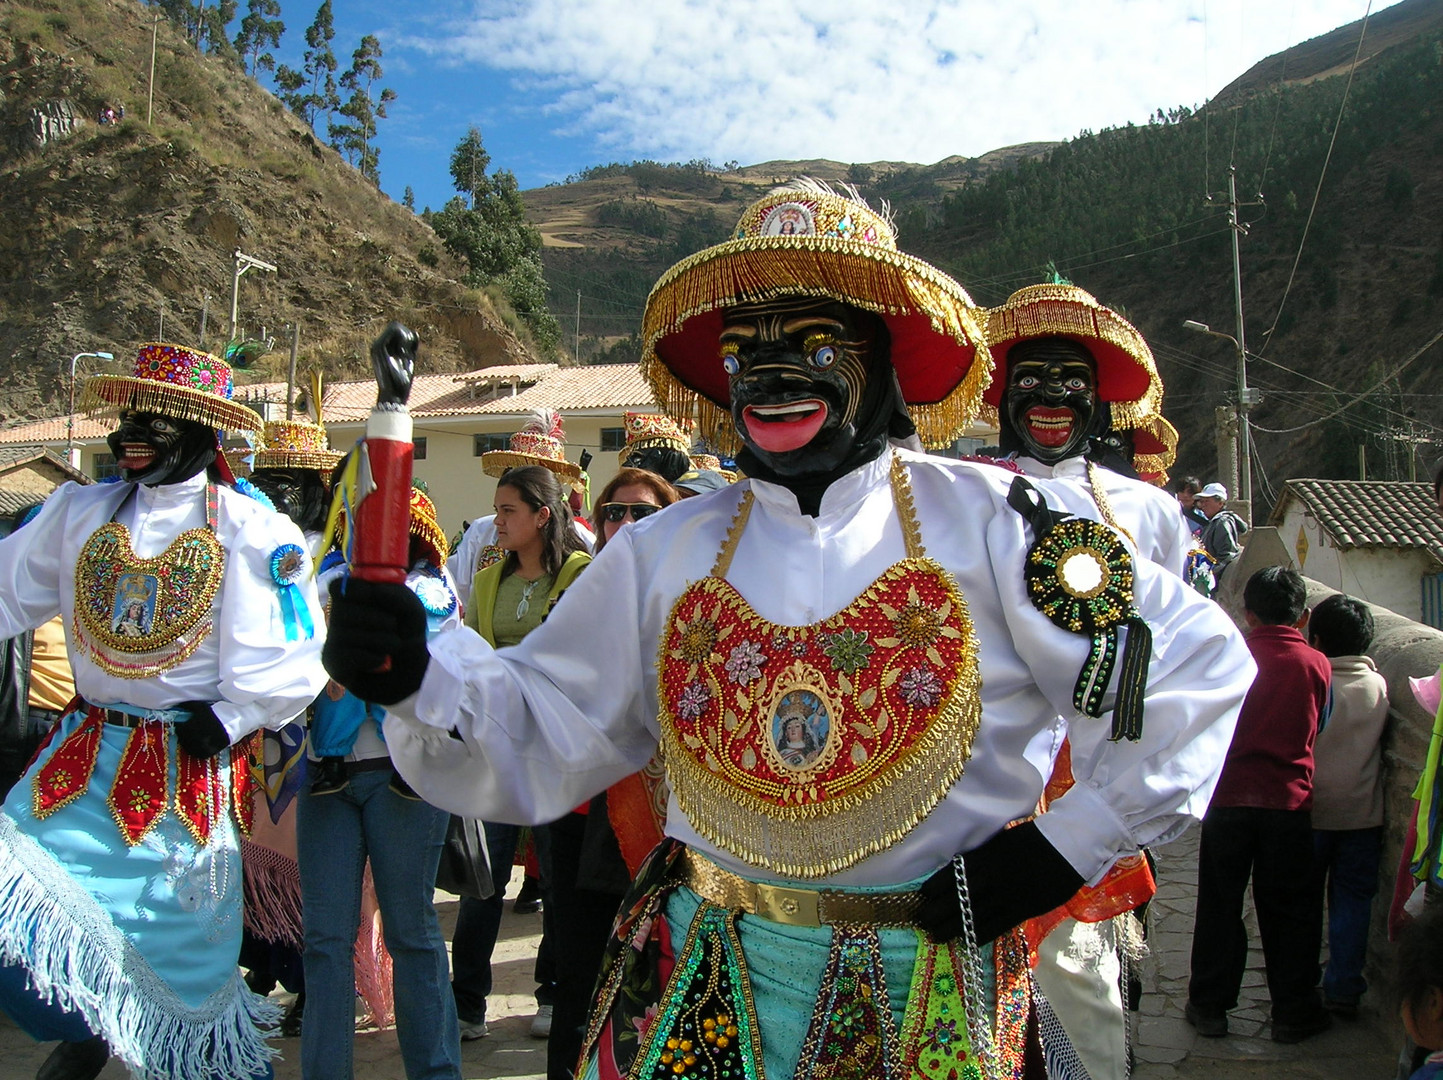 Peru - Cusco - Paucartambo - Fiesta Virgen del Carmen